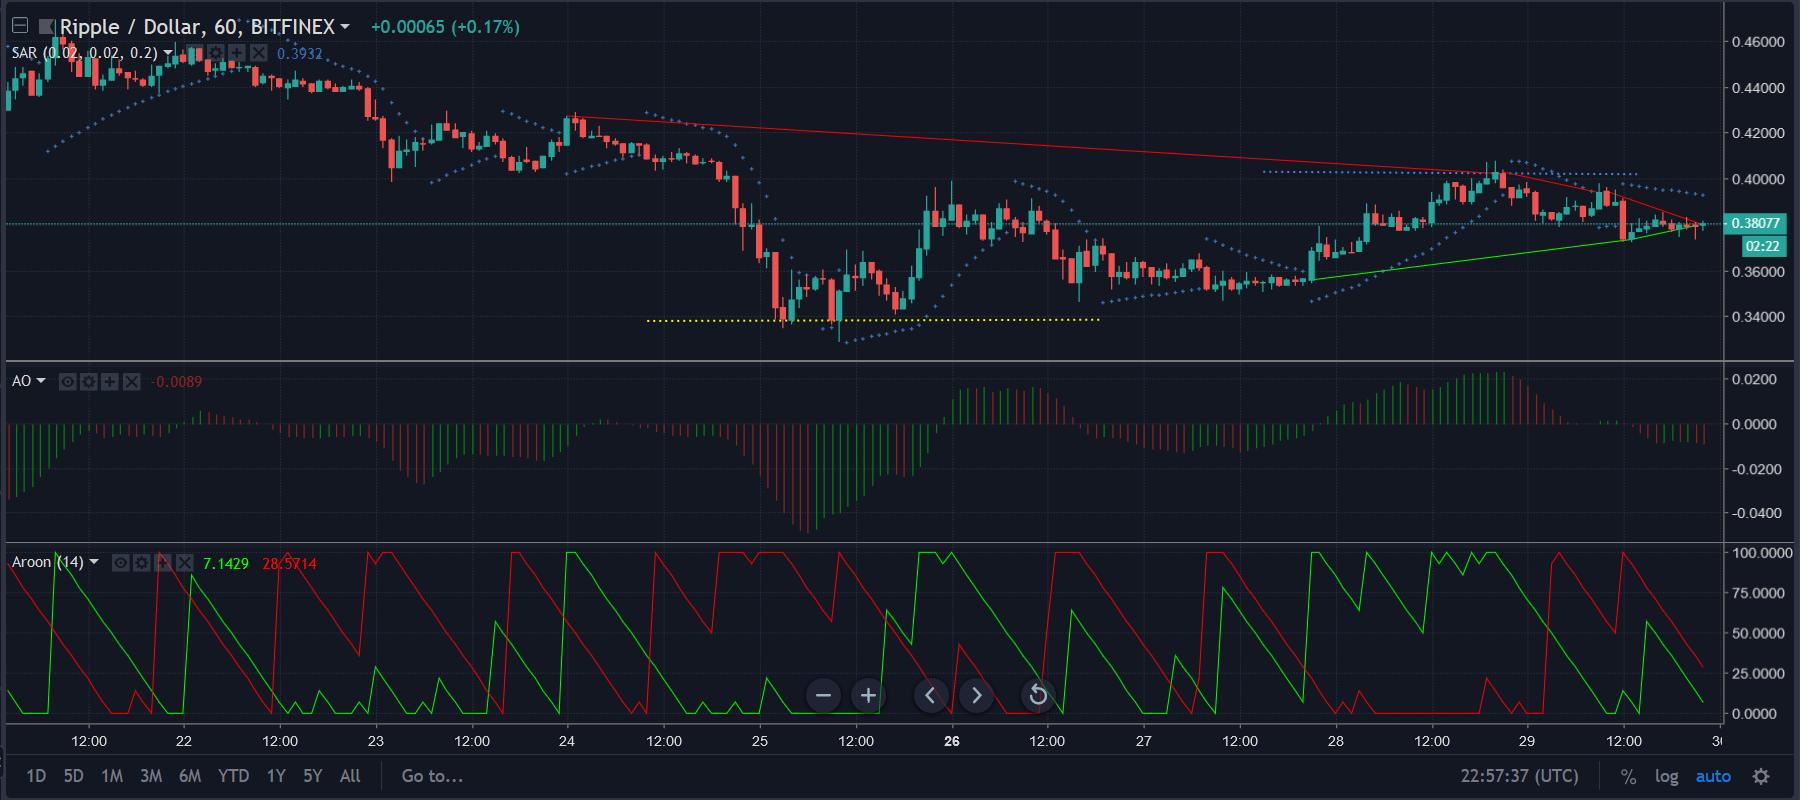 XRPUSD 1 hour chart | Source: TradingView